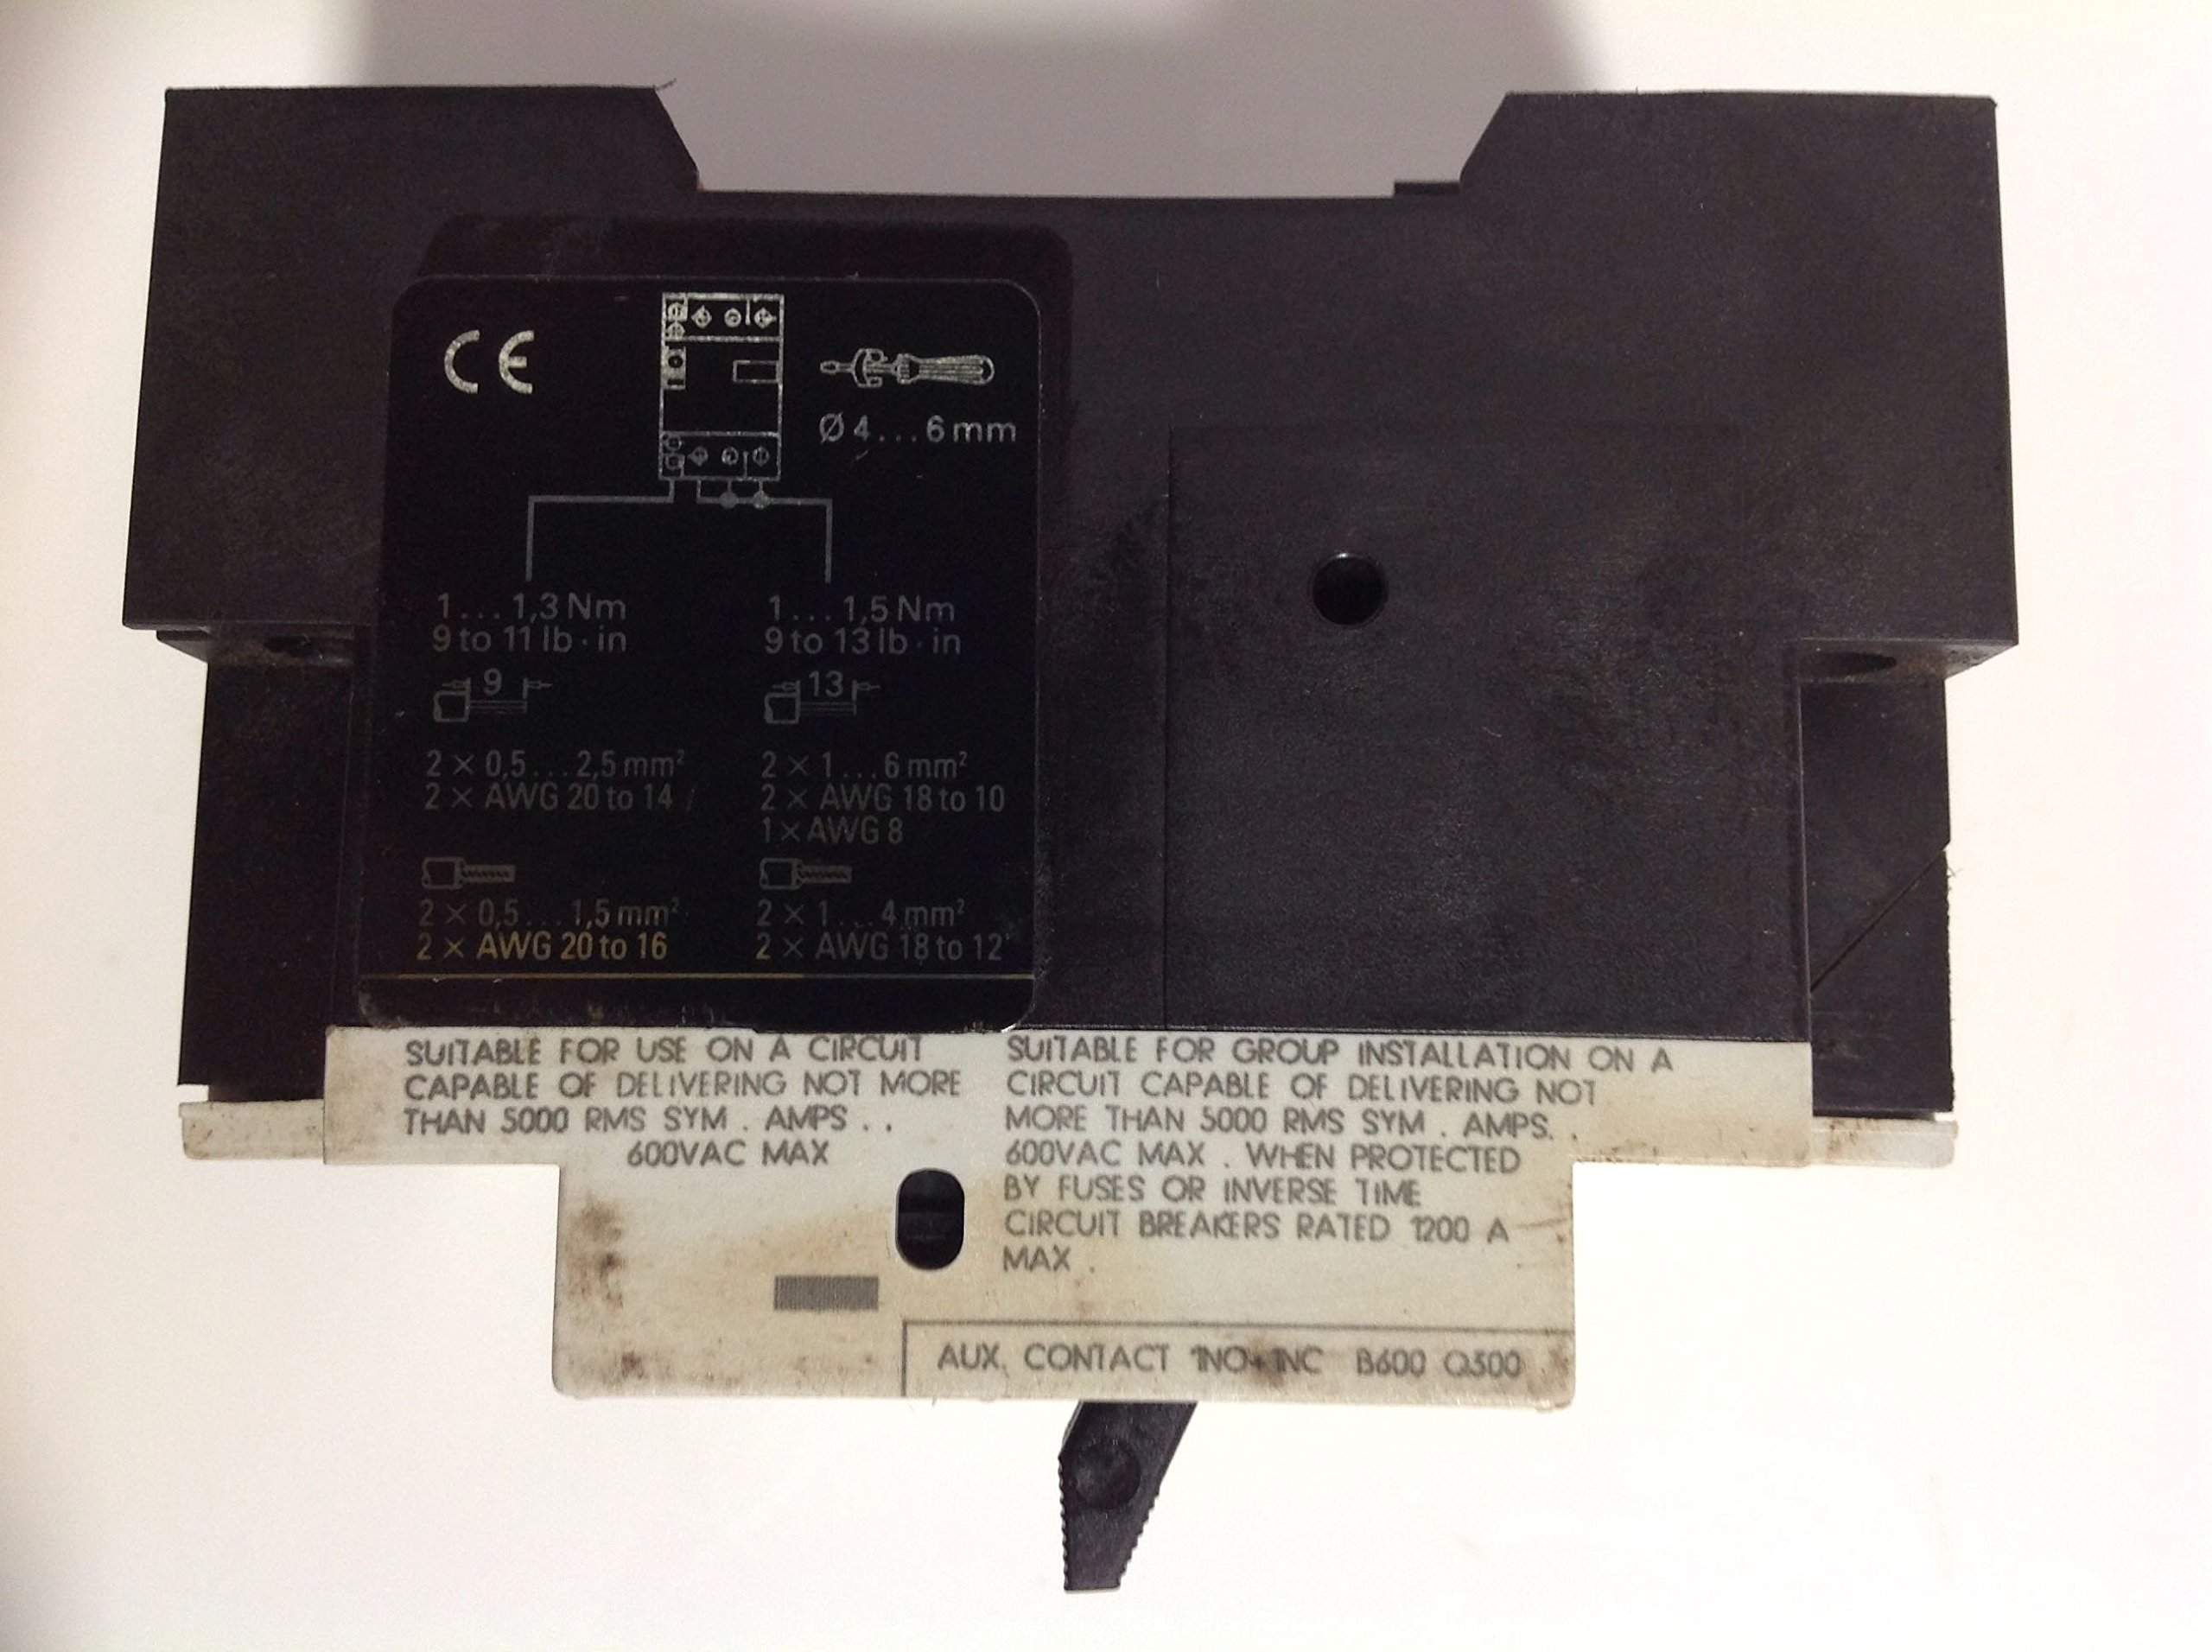 Siemens 3VU1300-1MH00 Starter Motor Protector 1.6-2.4amp by Siemens (Image #1)